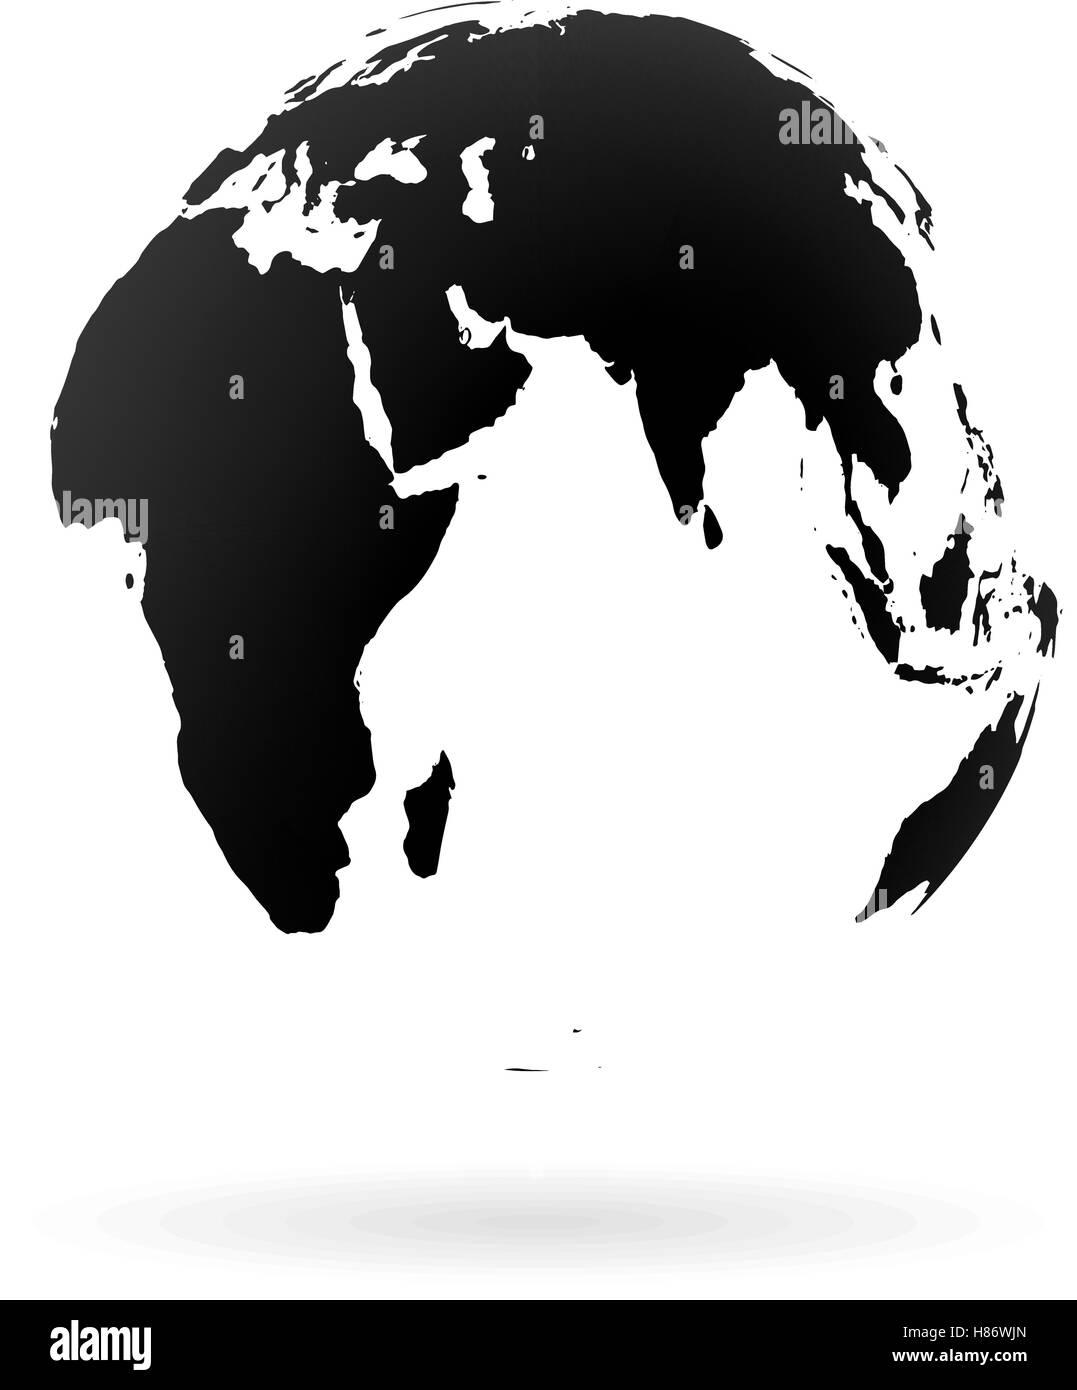 Highly Detailed Earth Globe Symbol, Arabian Countries, China, India. Black  On White Background.